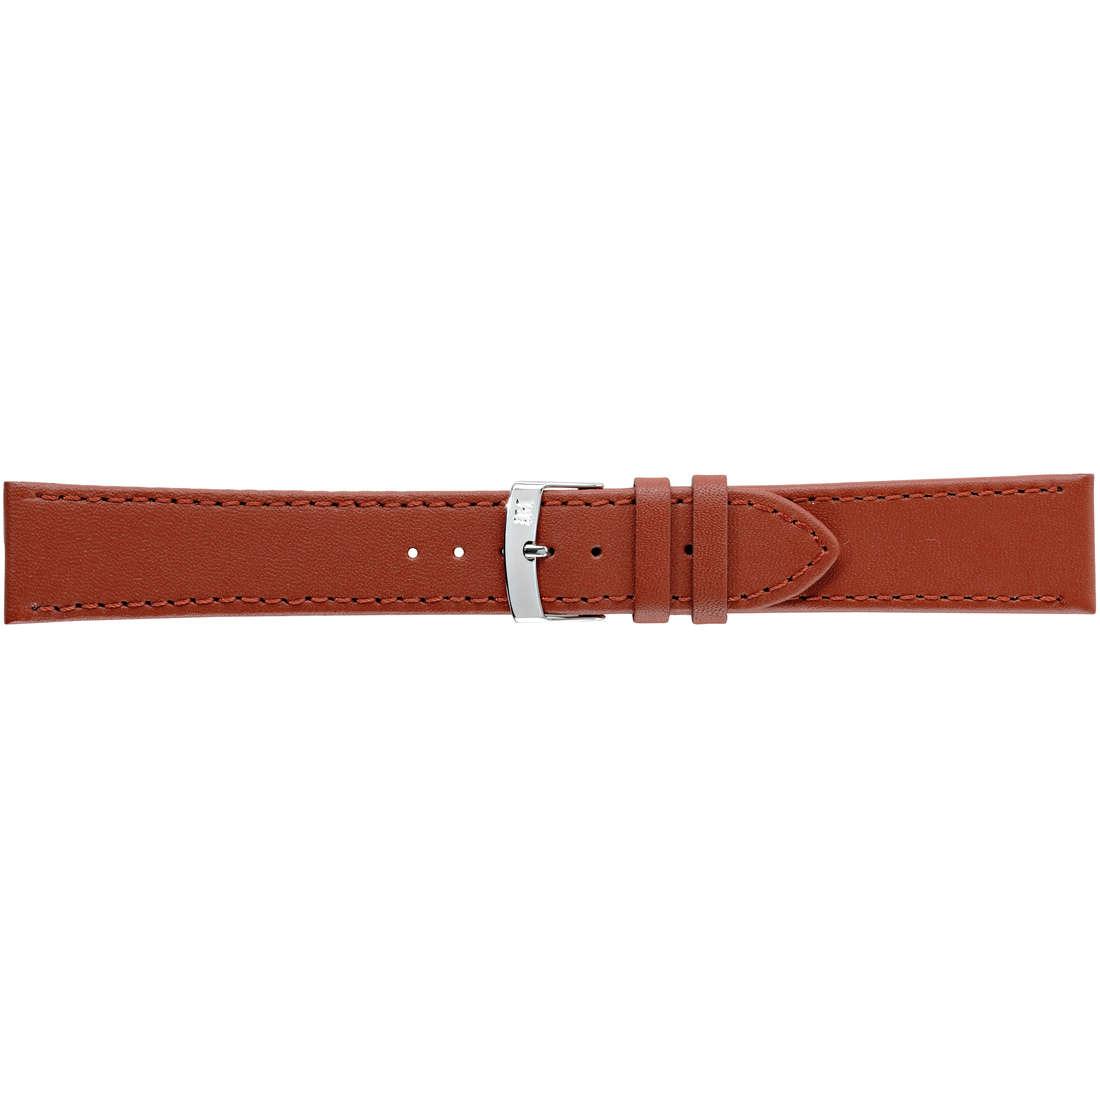 watch watch bands watch straps man Morellato Performance A01X2619875141CR10